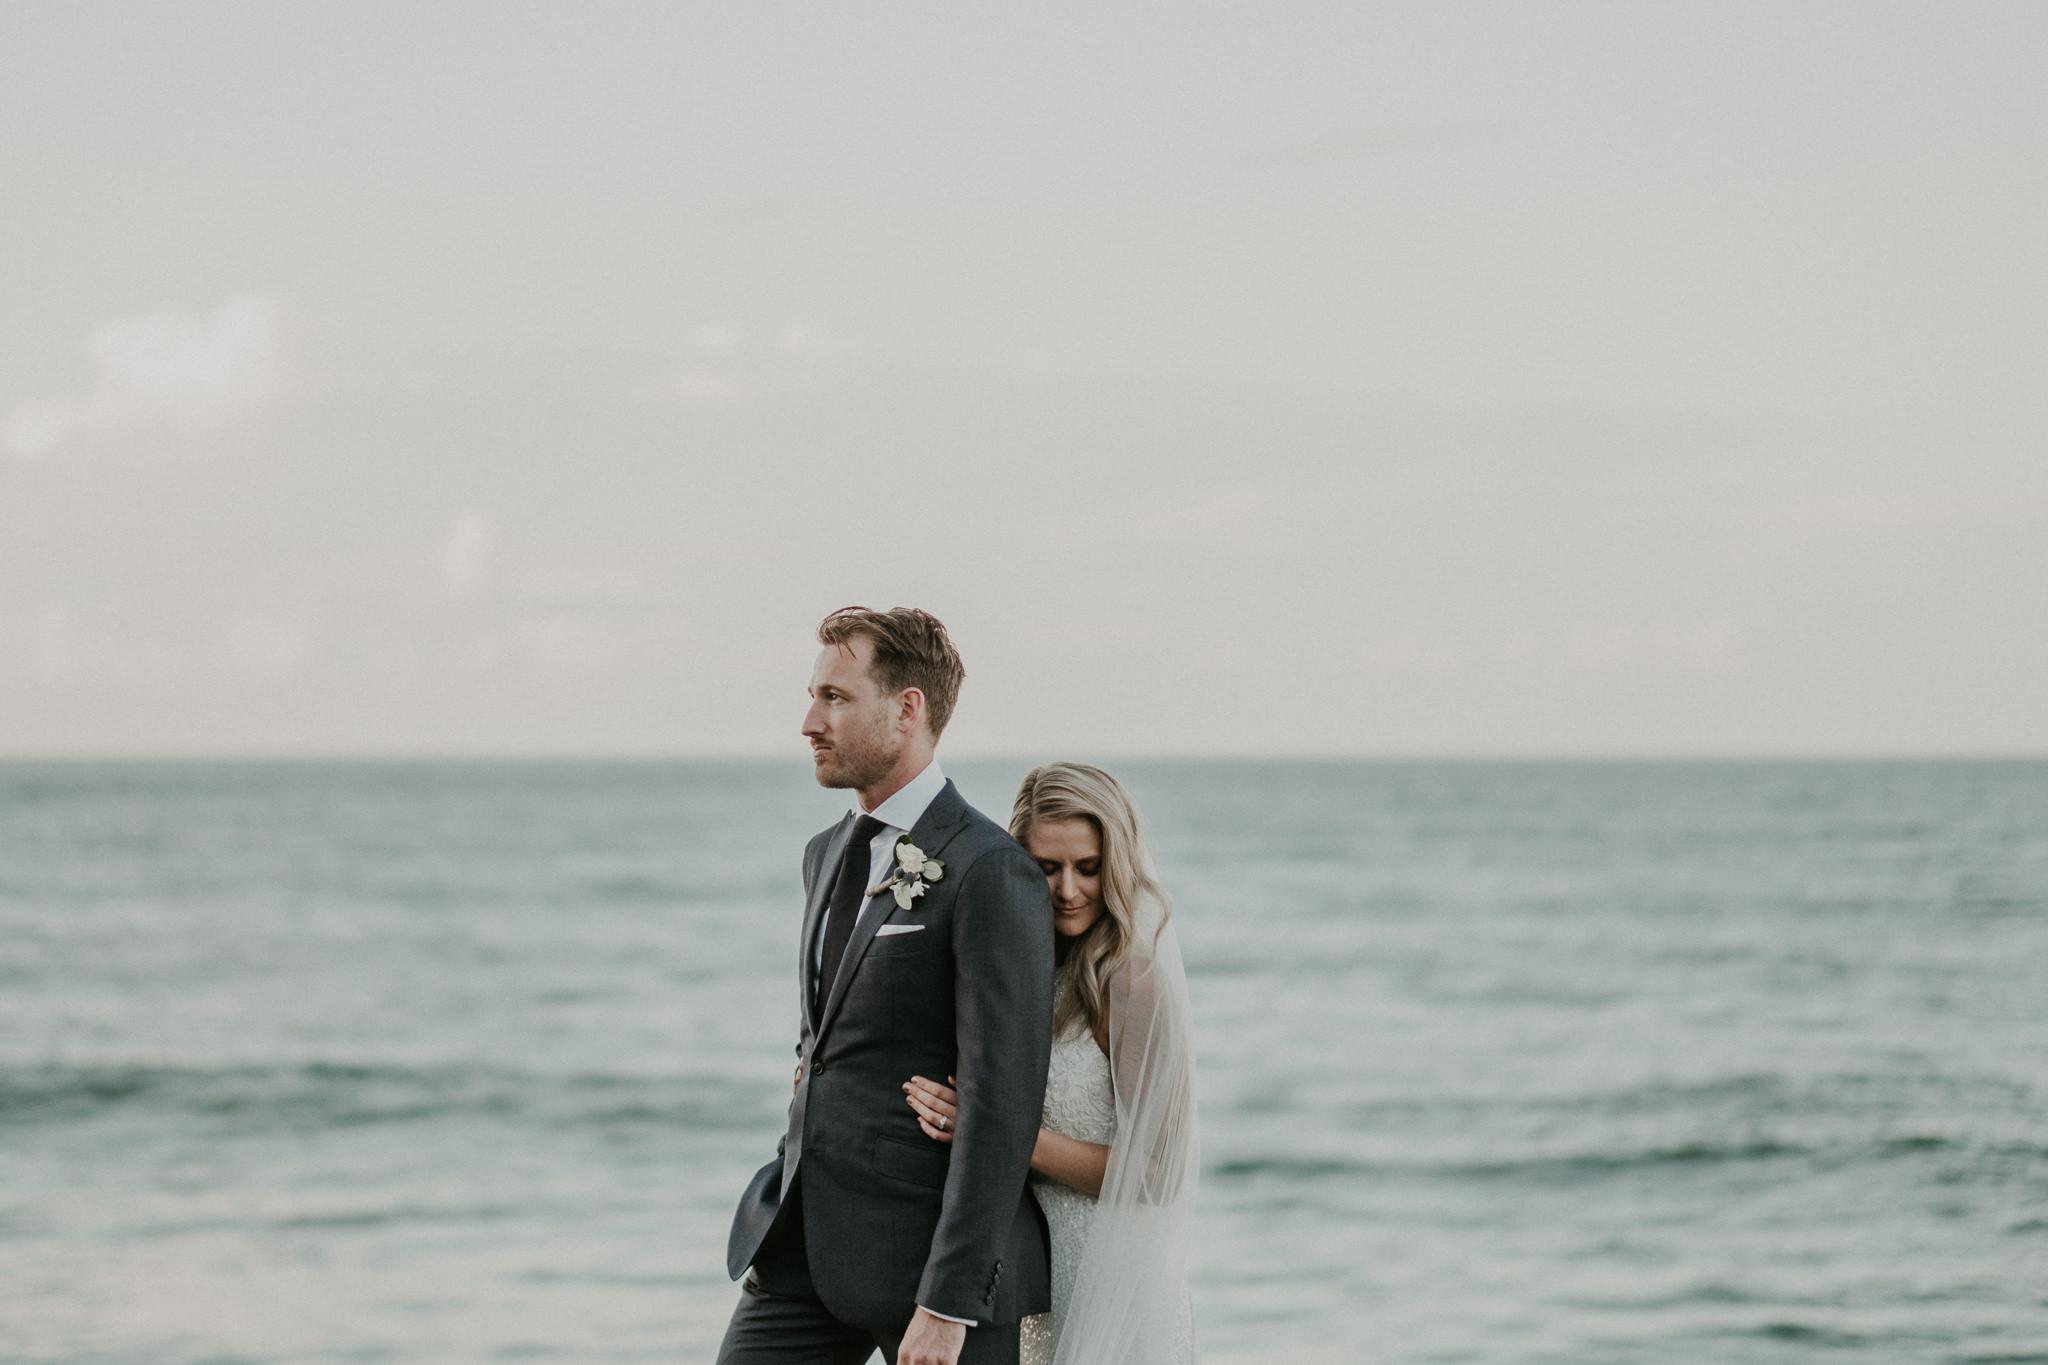 Krystle + Ben | Gold Coast Wedding Venue - Kirra Hill Community Centre | www.hamptoneventhire.com | Image by Lucas and Co Photography